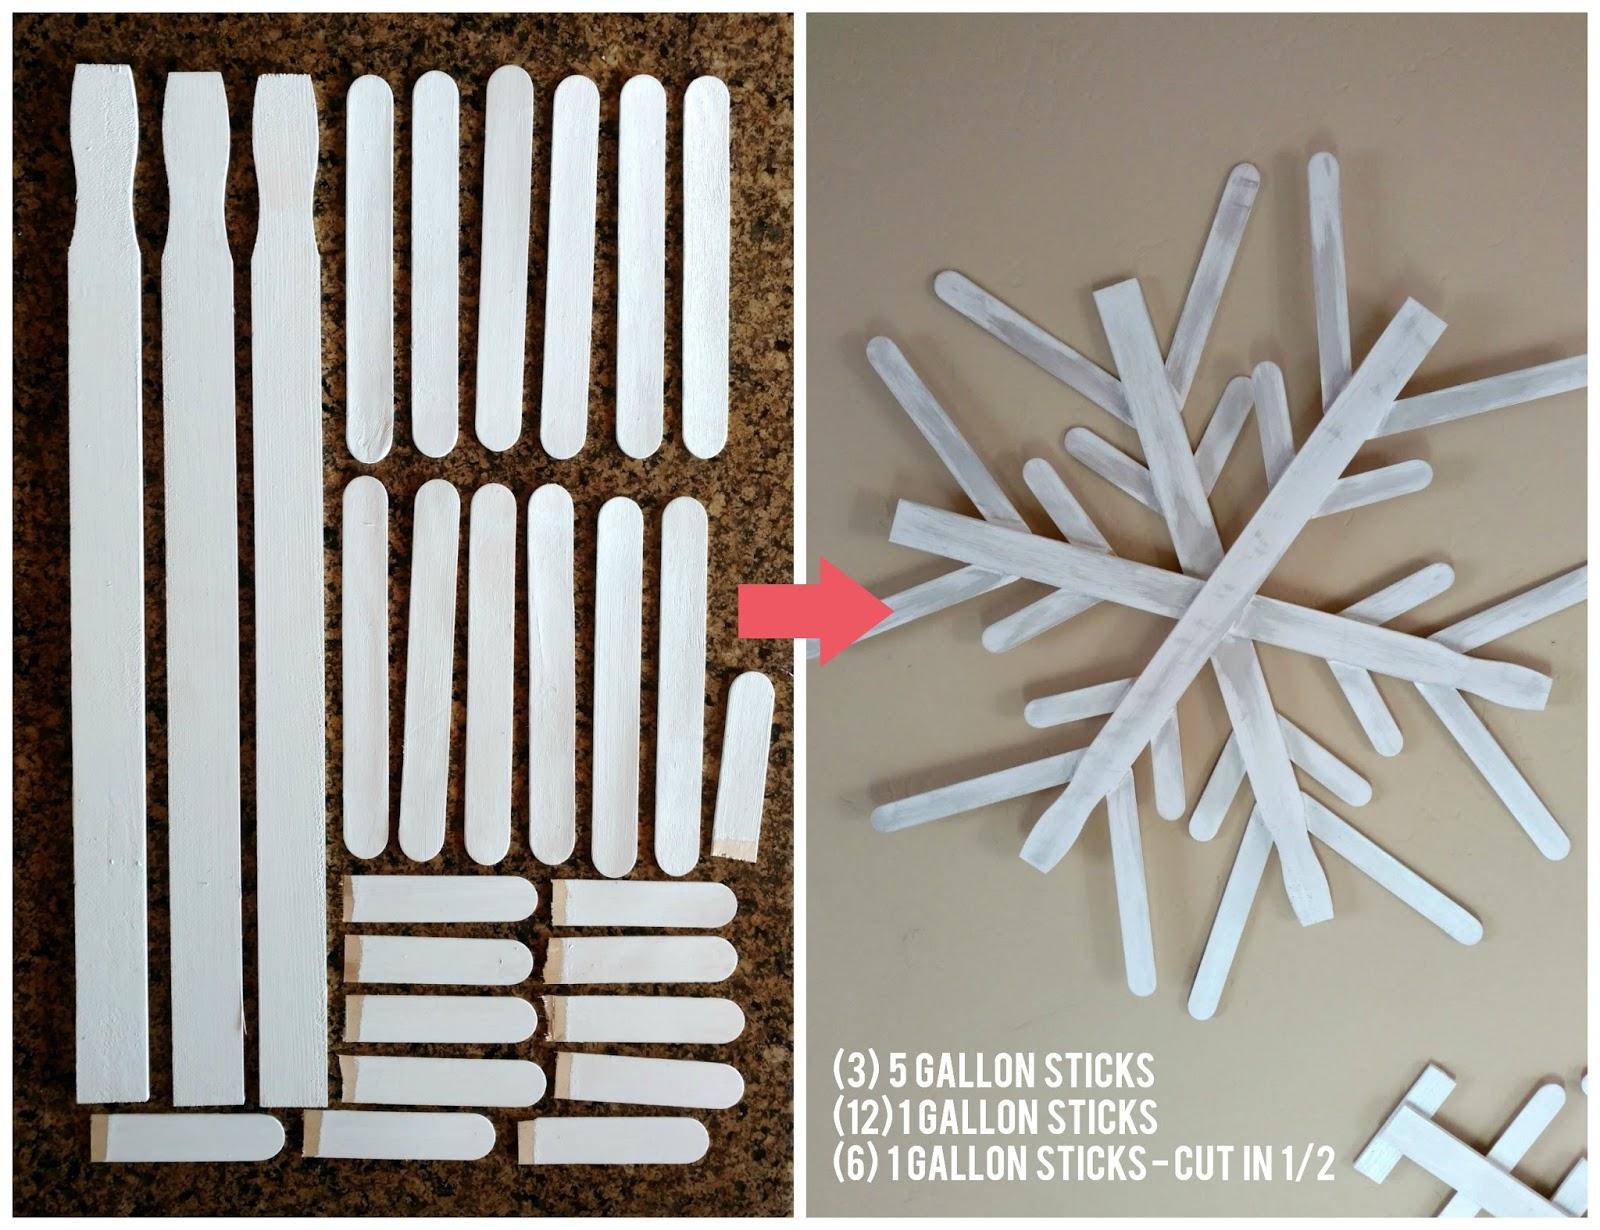 Rustic Paint Stick Snowflakes